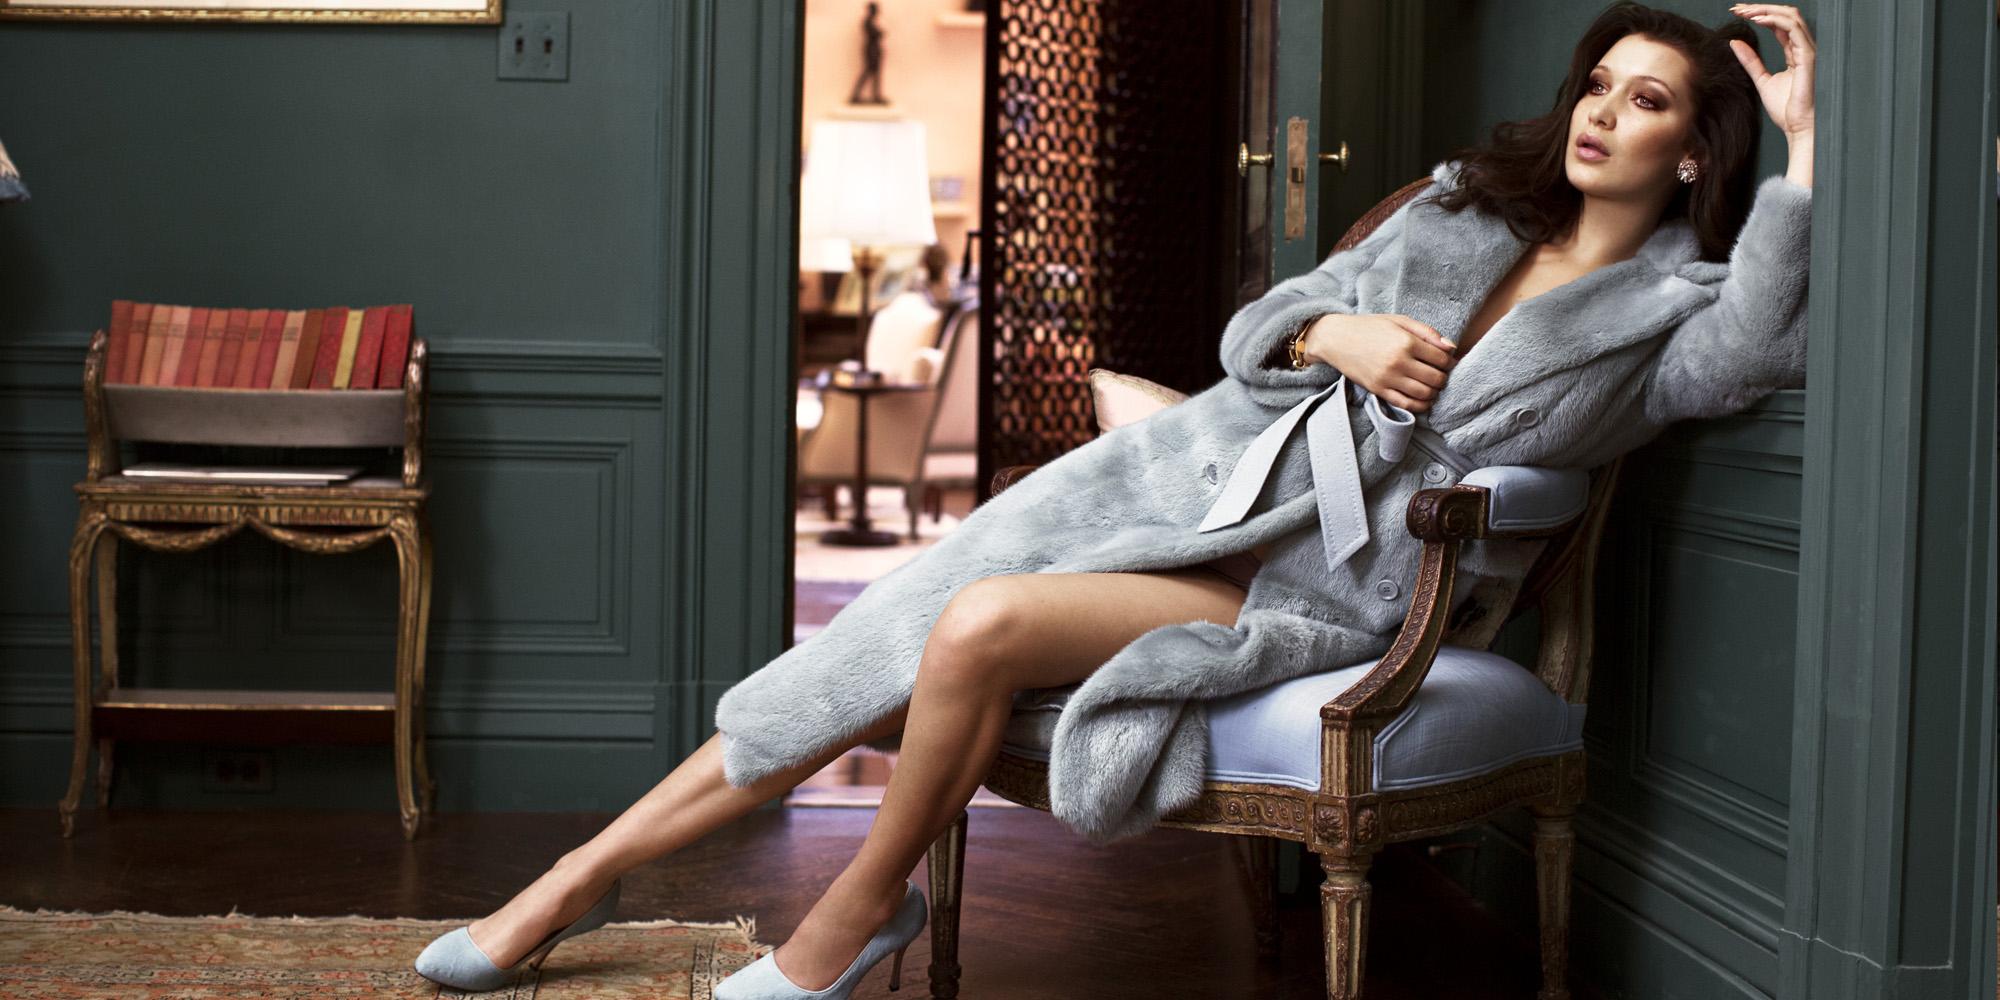 Christian Wallpaper Fall Bella Hadid Models At Gertrude Vanderbilt Whitney S Former